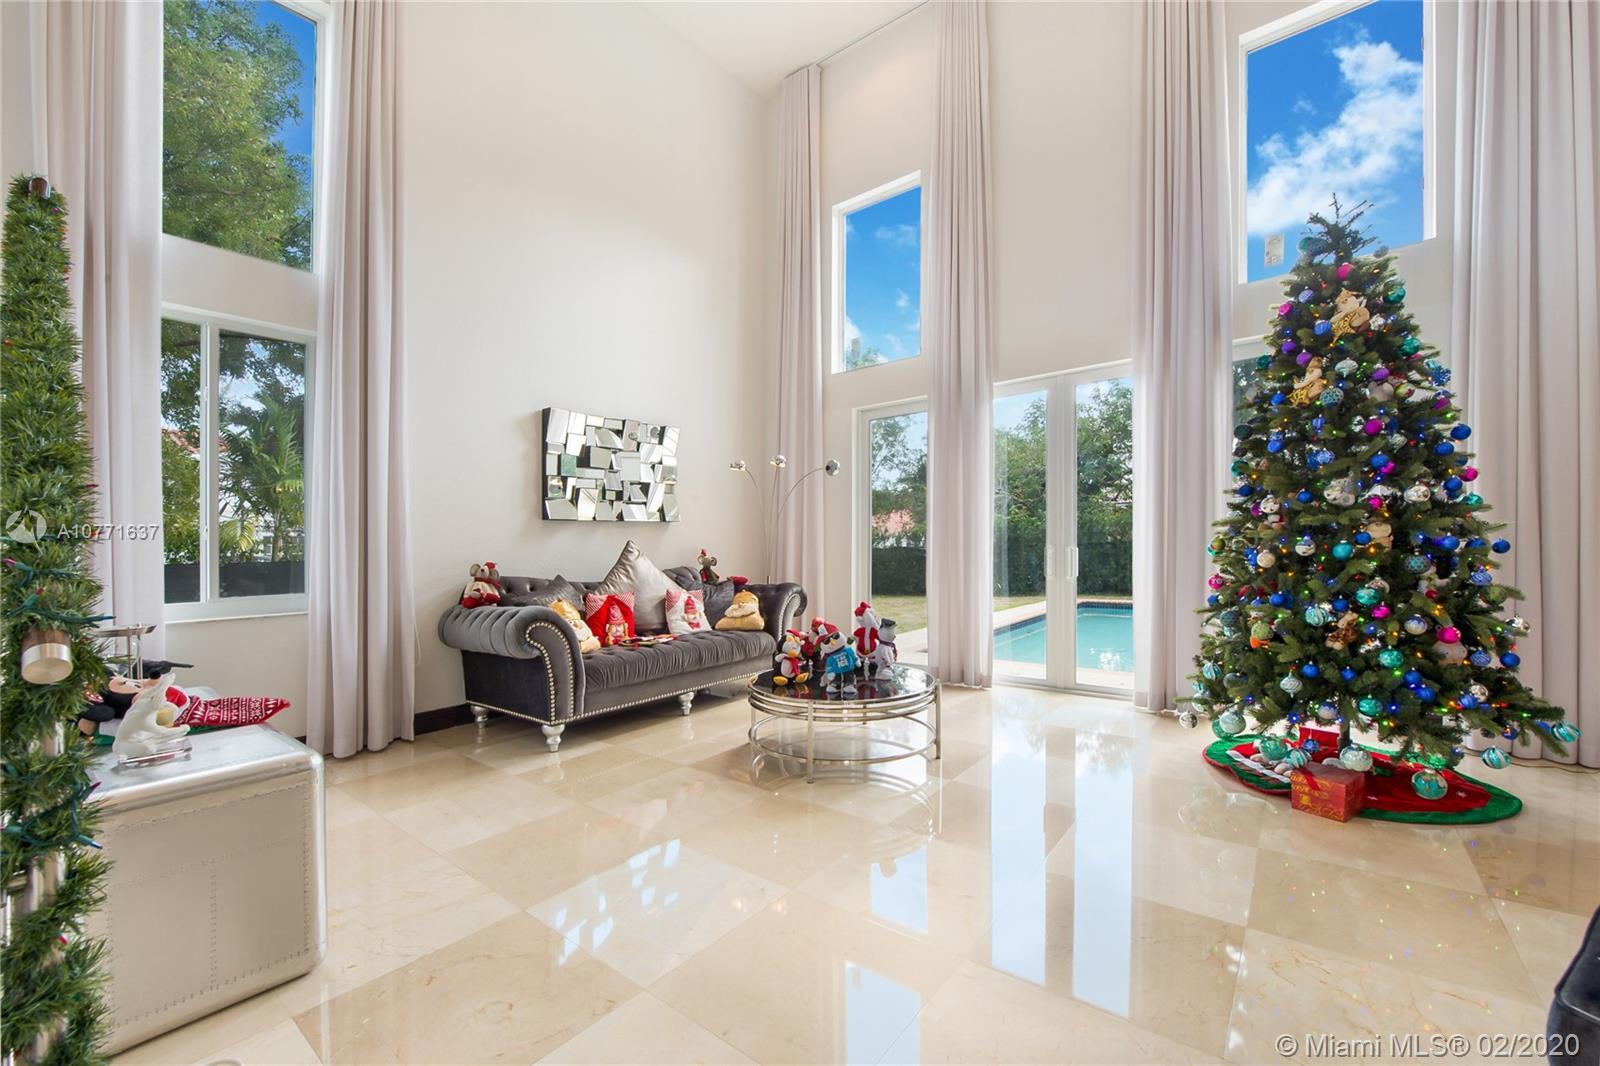 8164 SW 171, Palmetto Bay, Florida 33157, 5 Bedrooms Bedrooms, ,4 BathroomsBathrooms,Residential,For Sale,8164 SW 171,A10771637